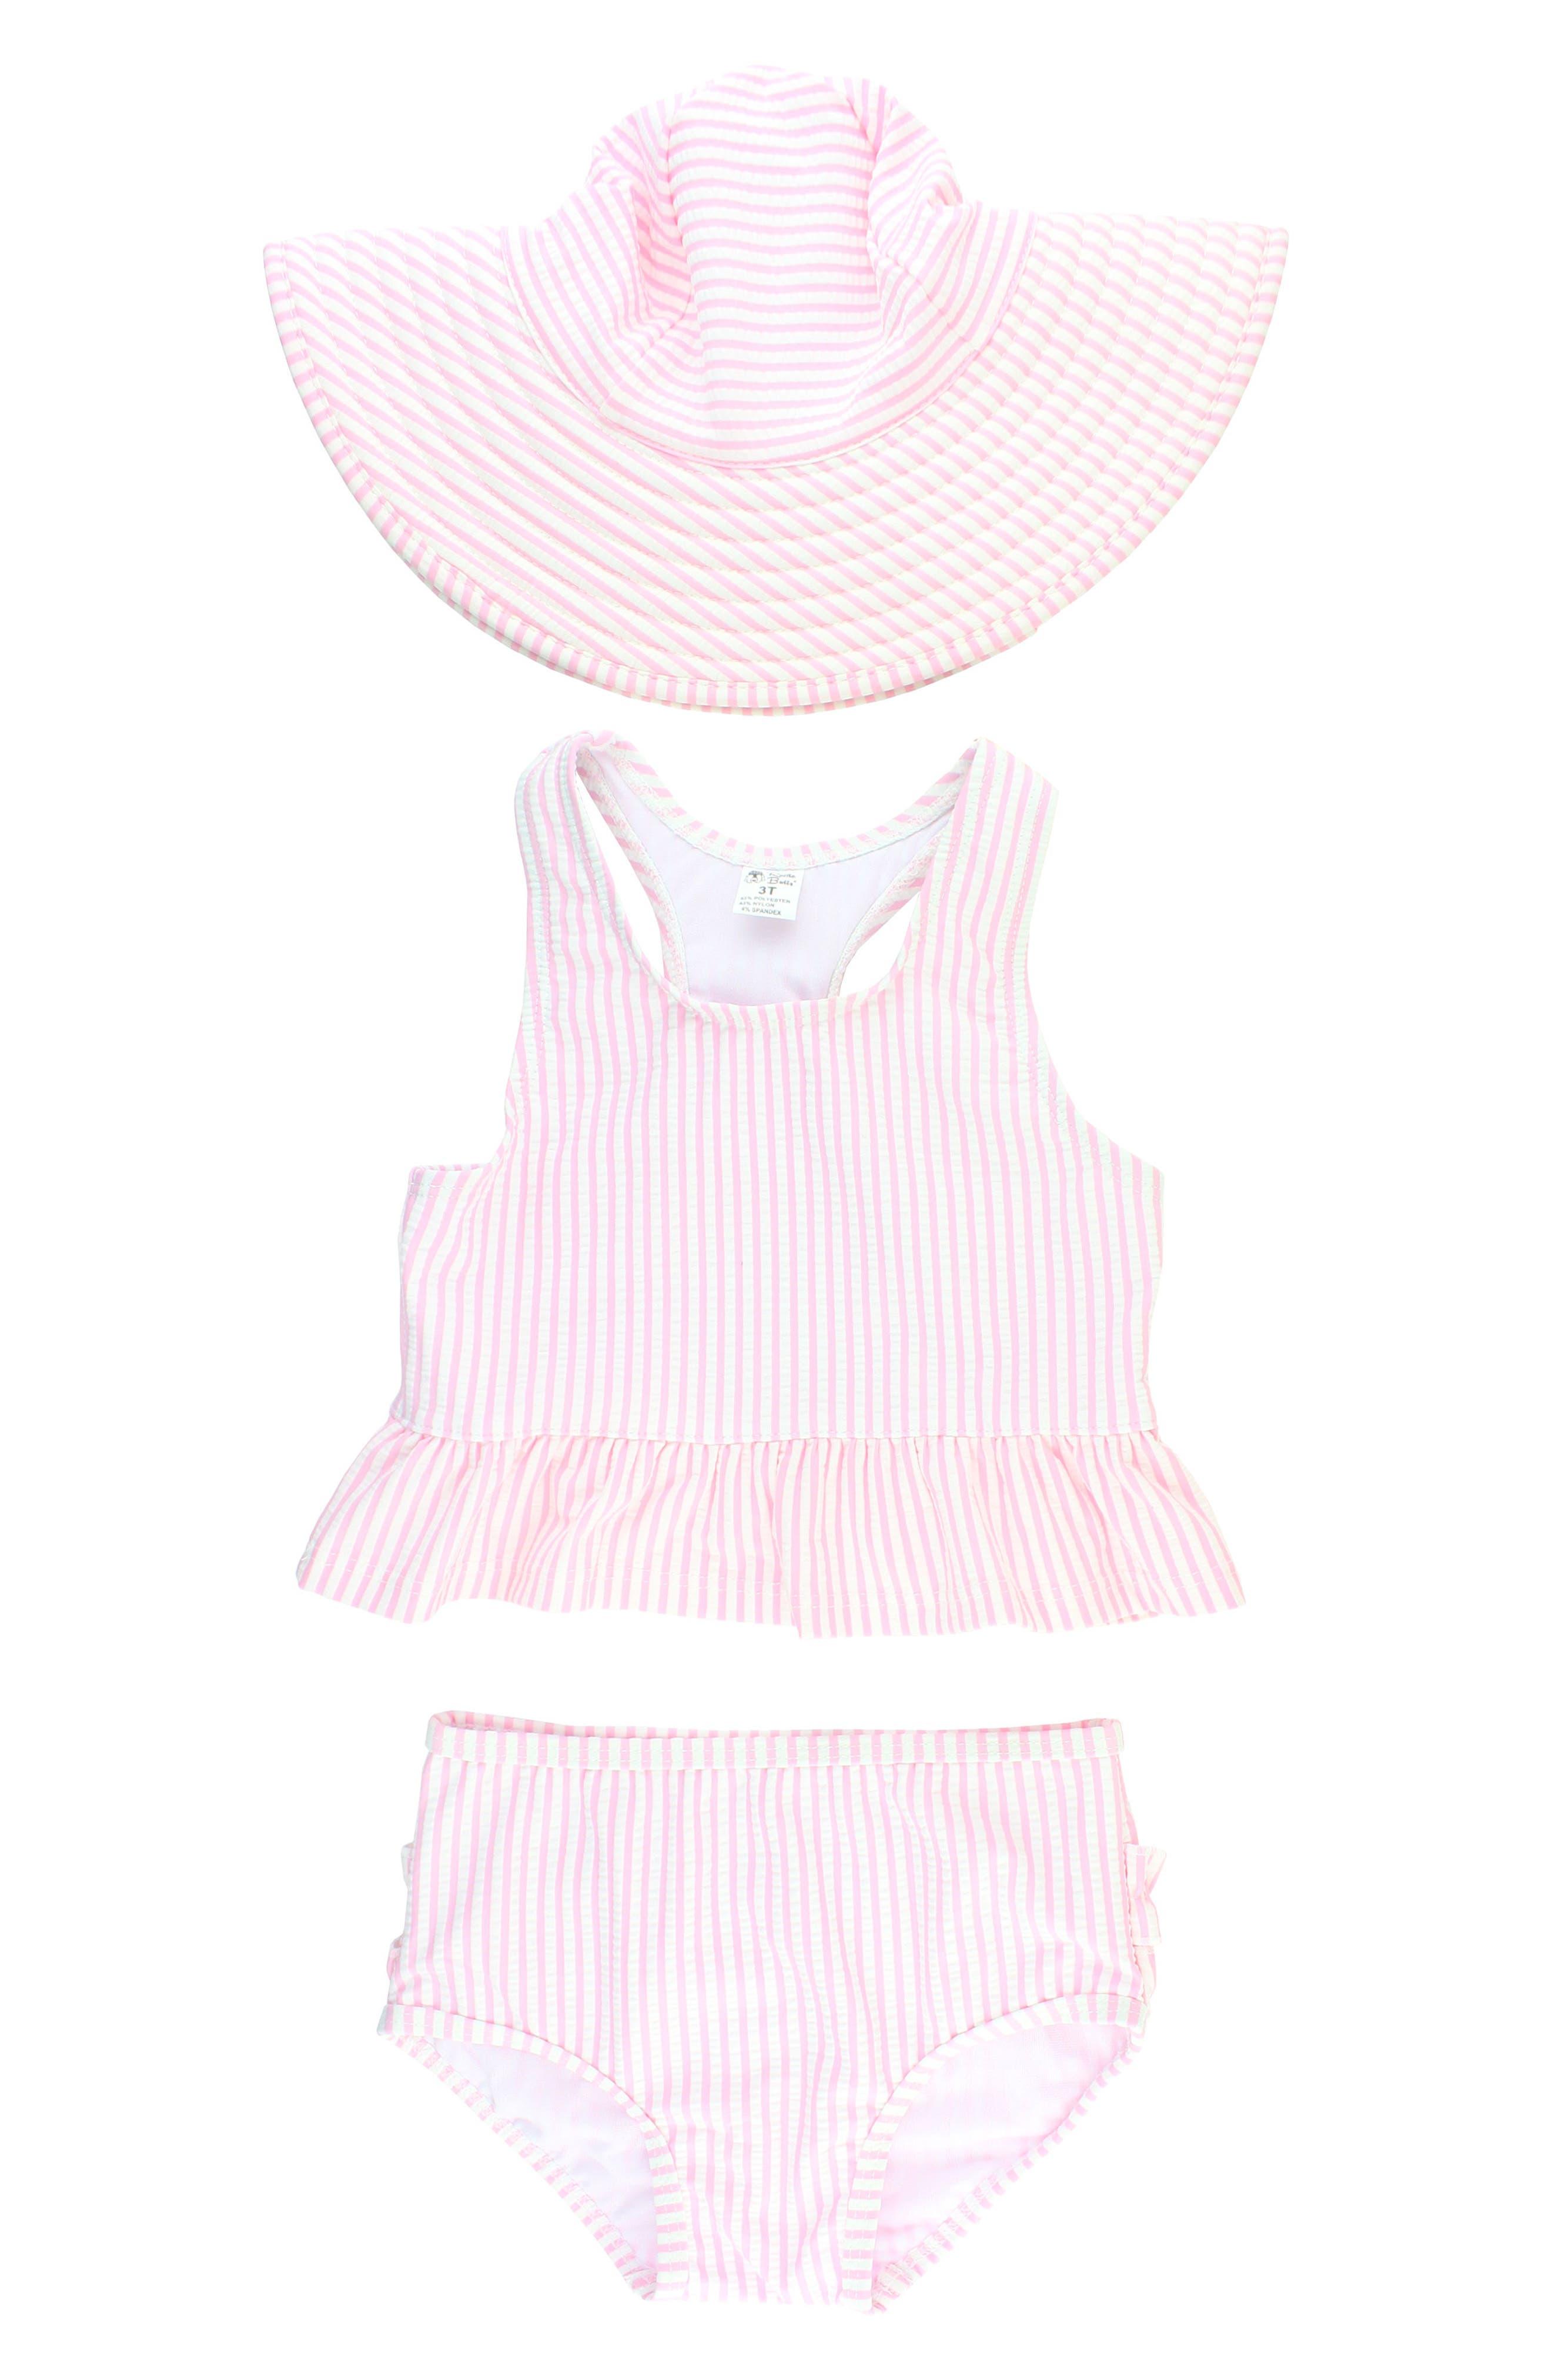 Main Image - RuffleButts Two-Piece Swimsuit & Hat Set (Toddler Girls & Little Girls)